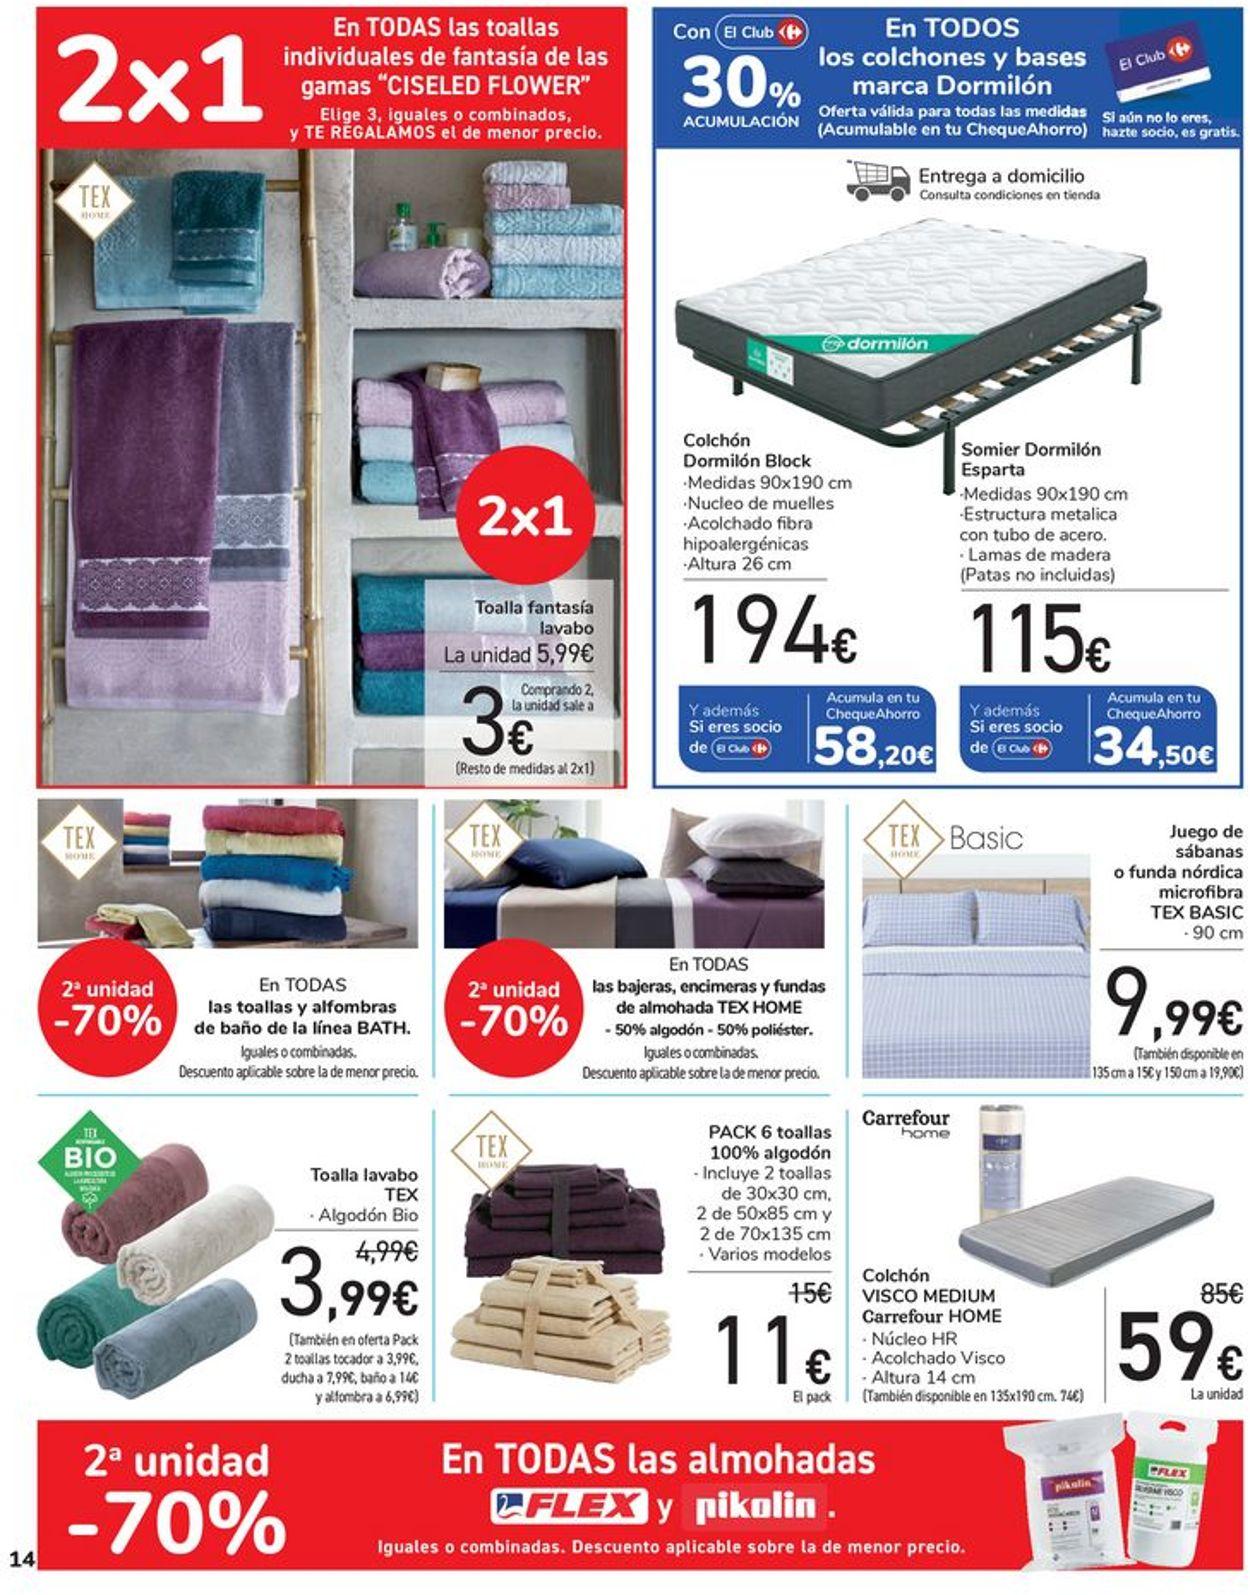 Carrefour Super Chollos Folleto - 16.04-26.04.2021 (Página 14)